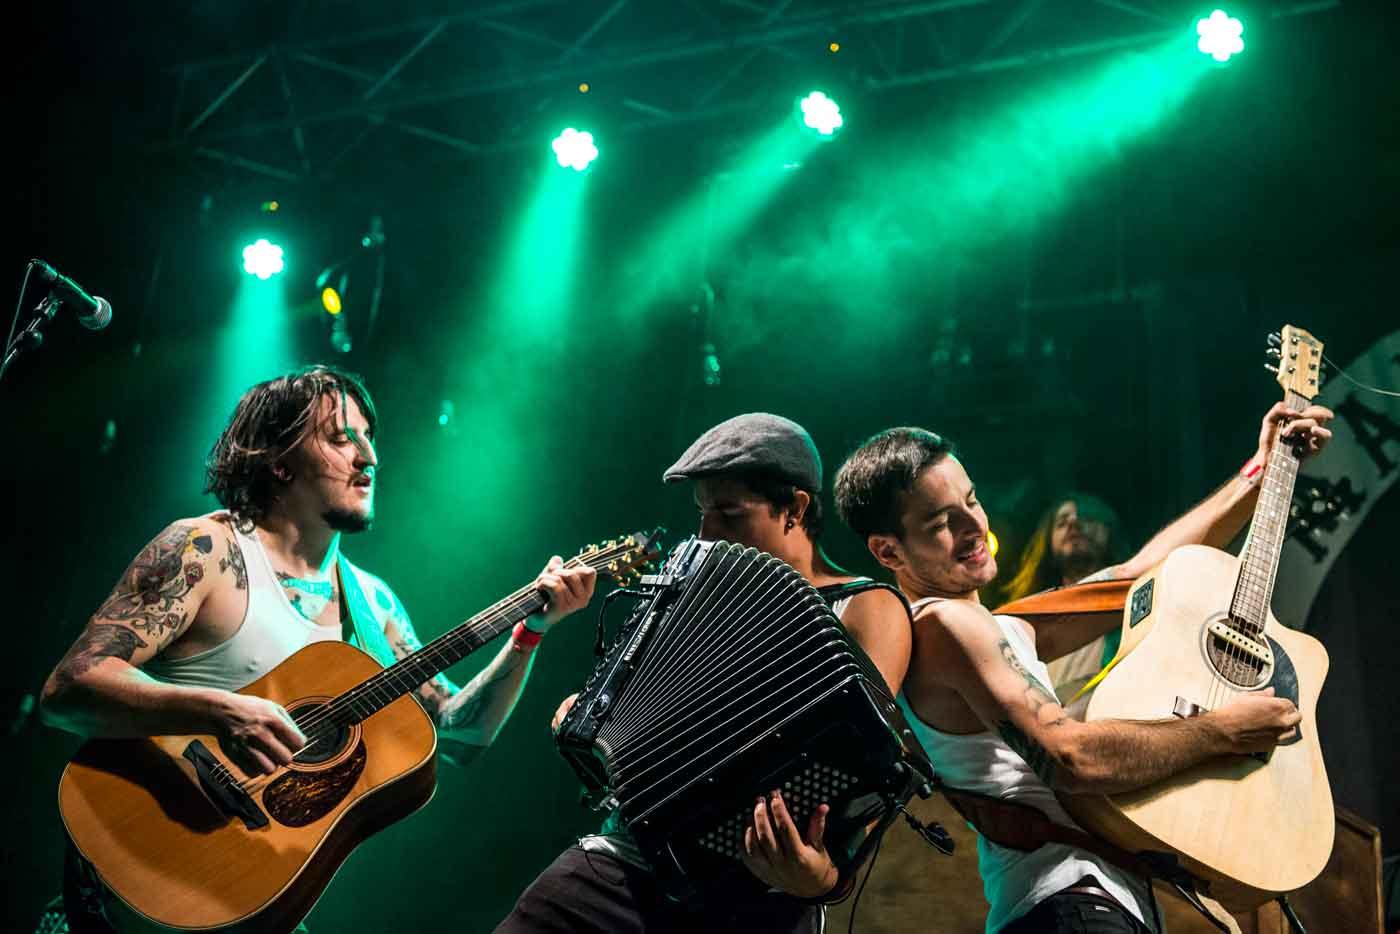 Agenda musical de la Aste Nagusia de Bilbao (2019)